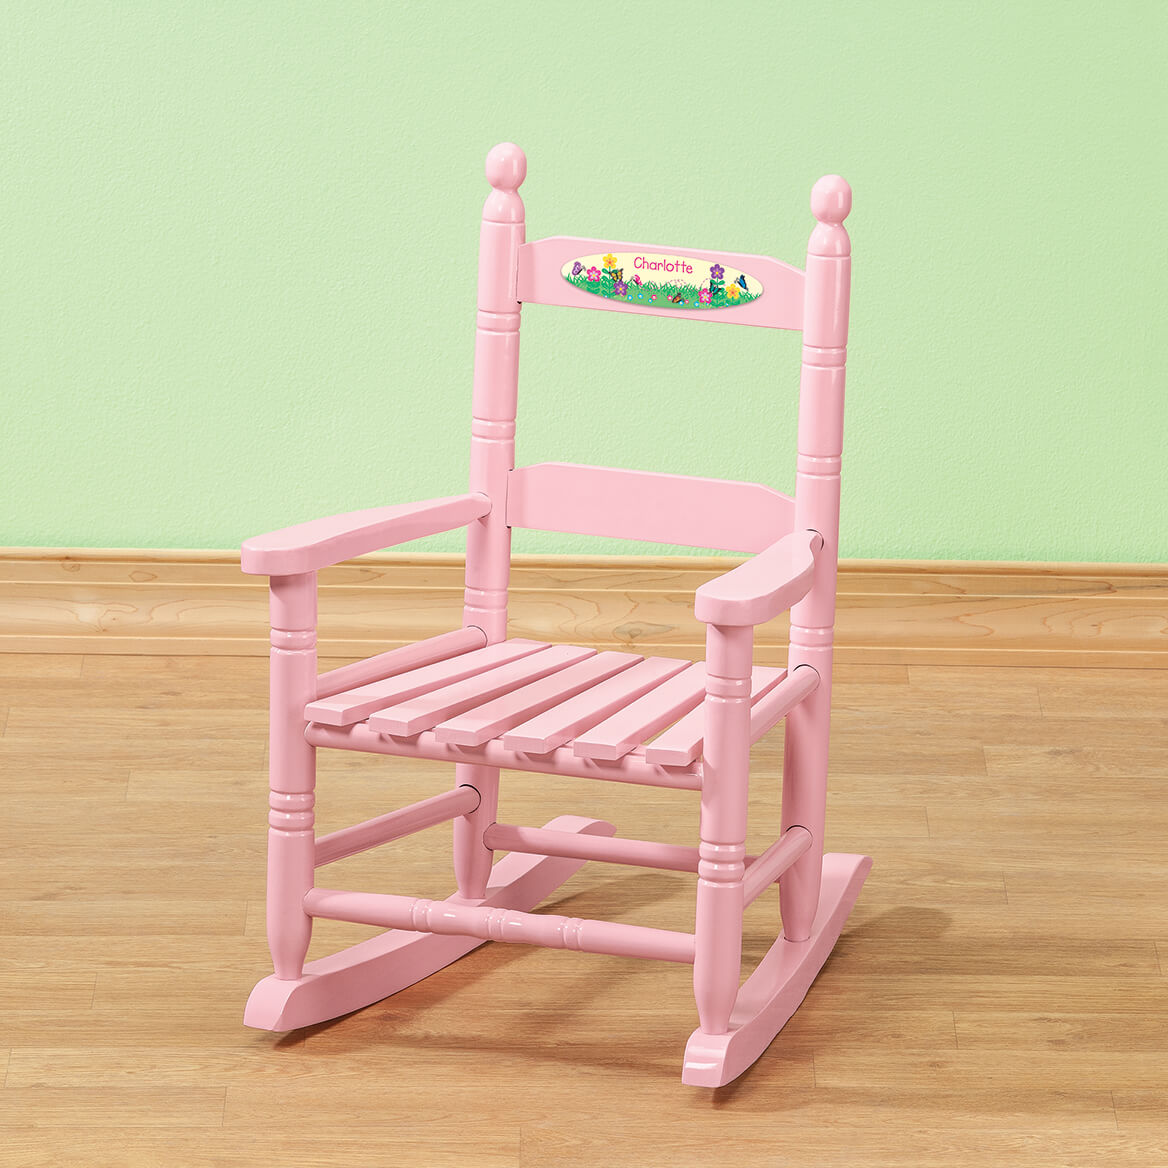 Personalized Flowers & Butterflies Children's Rocking Chair-371720